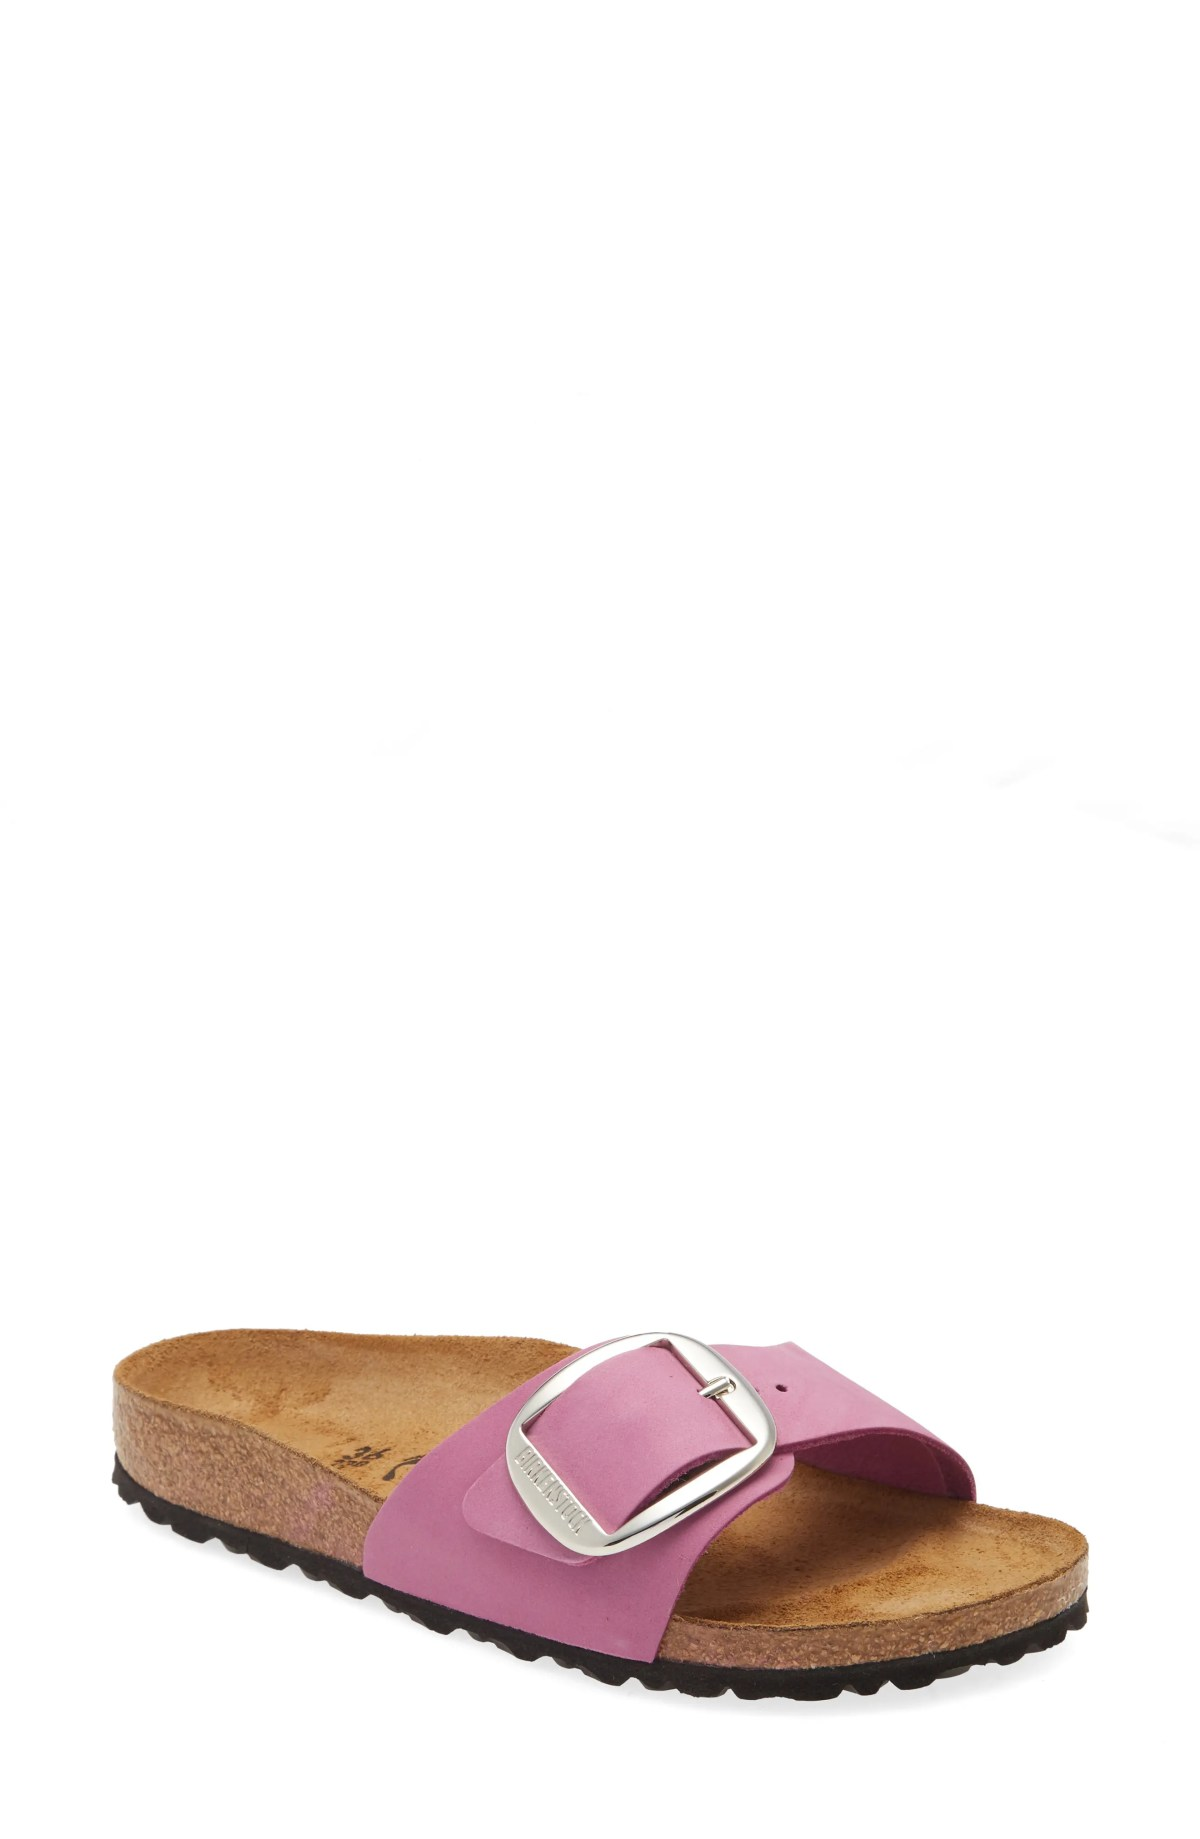 BIRKENSTOCK Madrid Hex Slide Sandal, Main, color, PURPLE ORCHID NUBUCK LEATHER